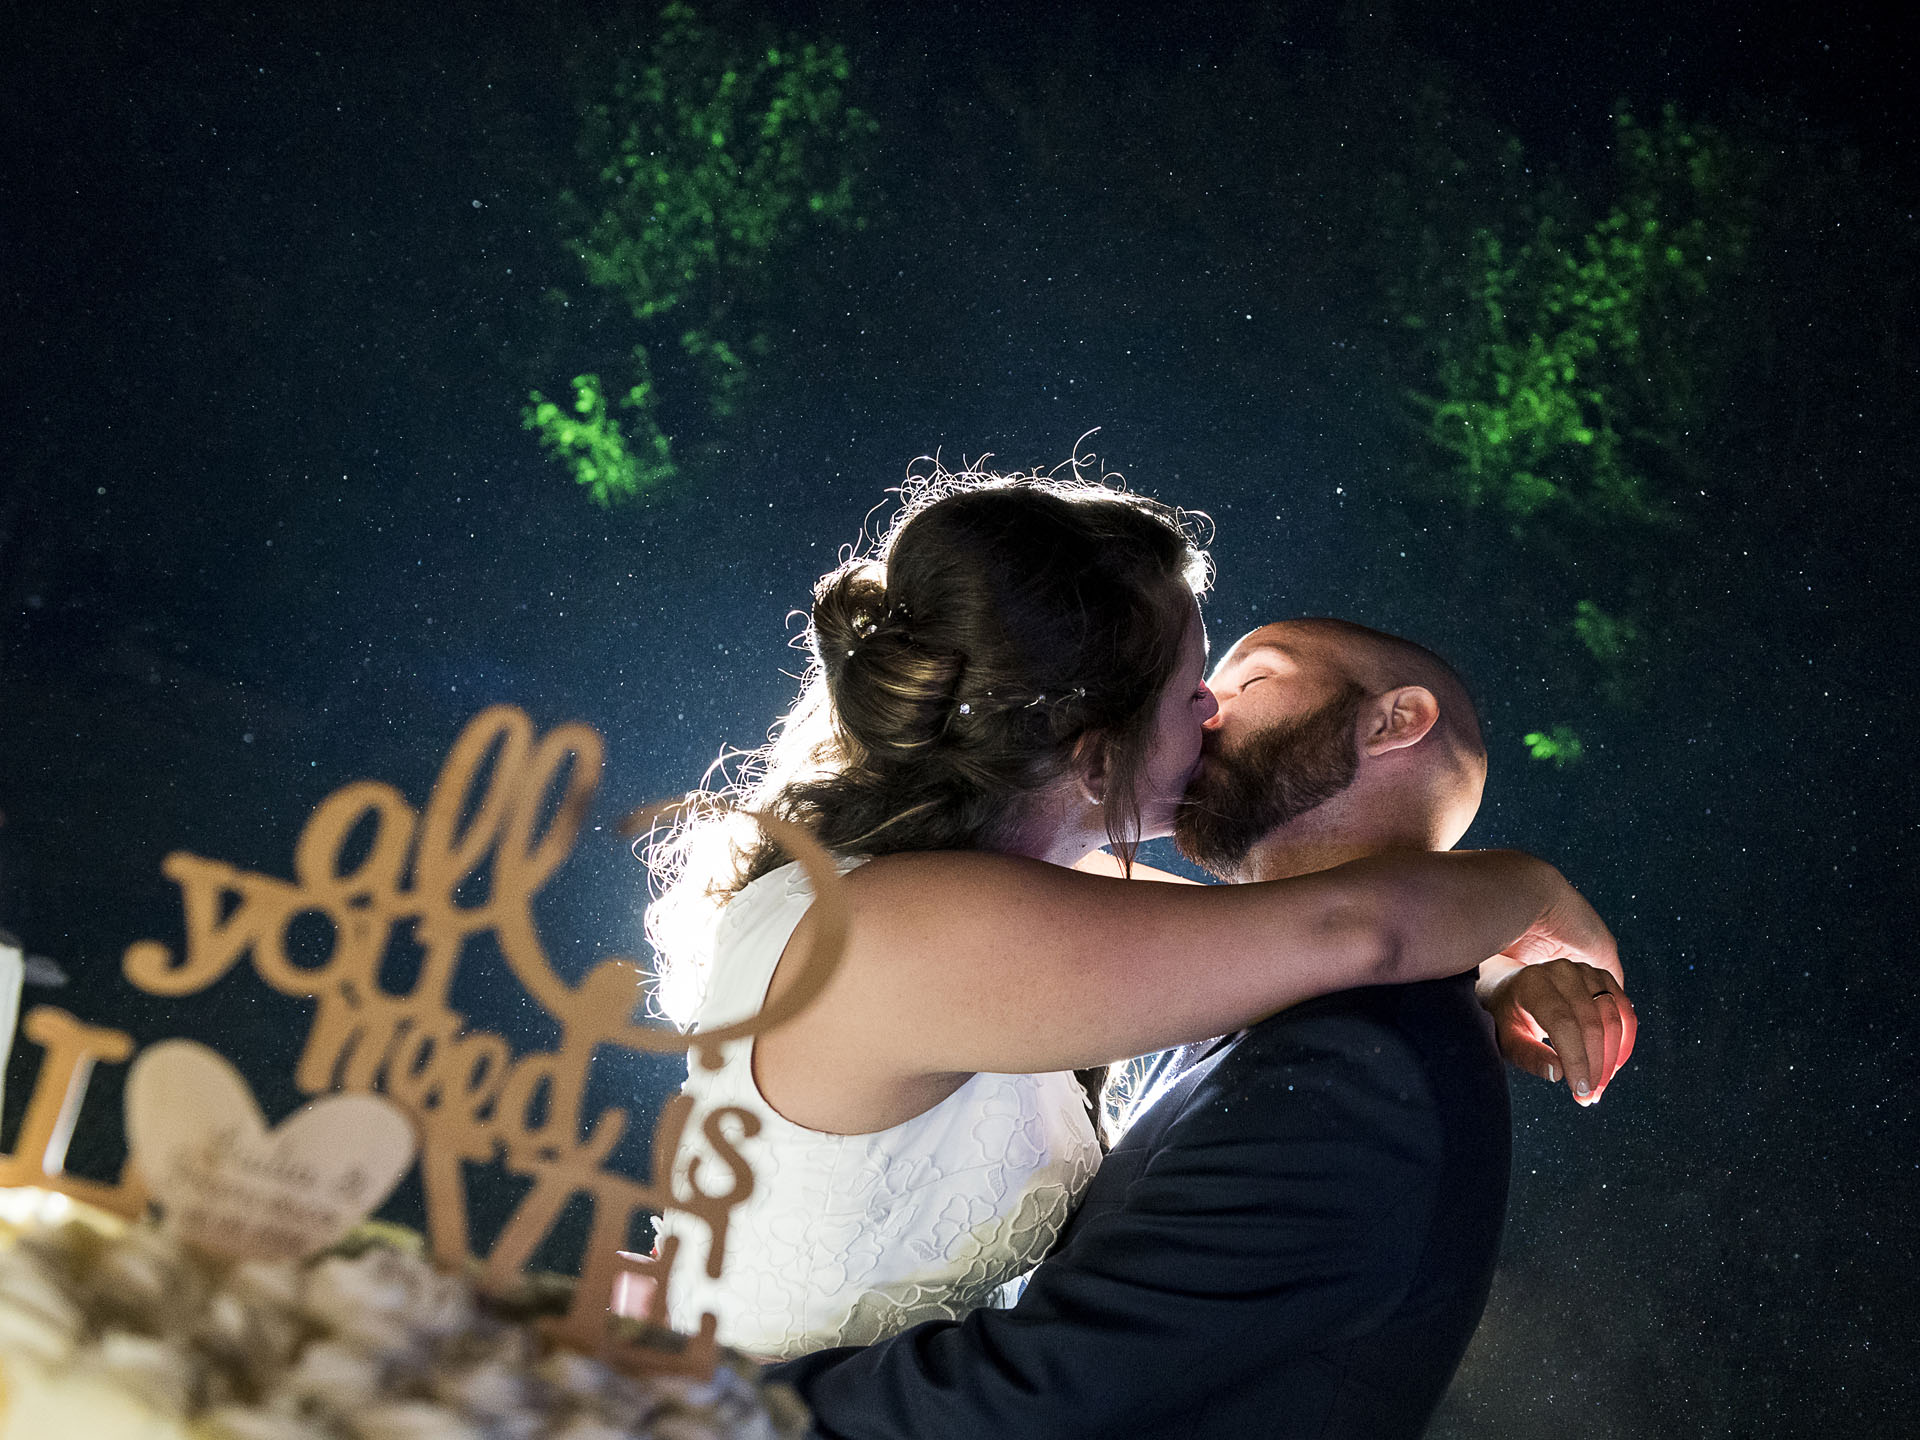 wedding photographer in Italy. Domande frequenti. Faq.